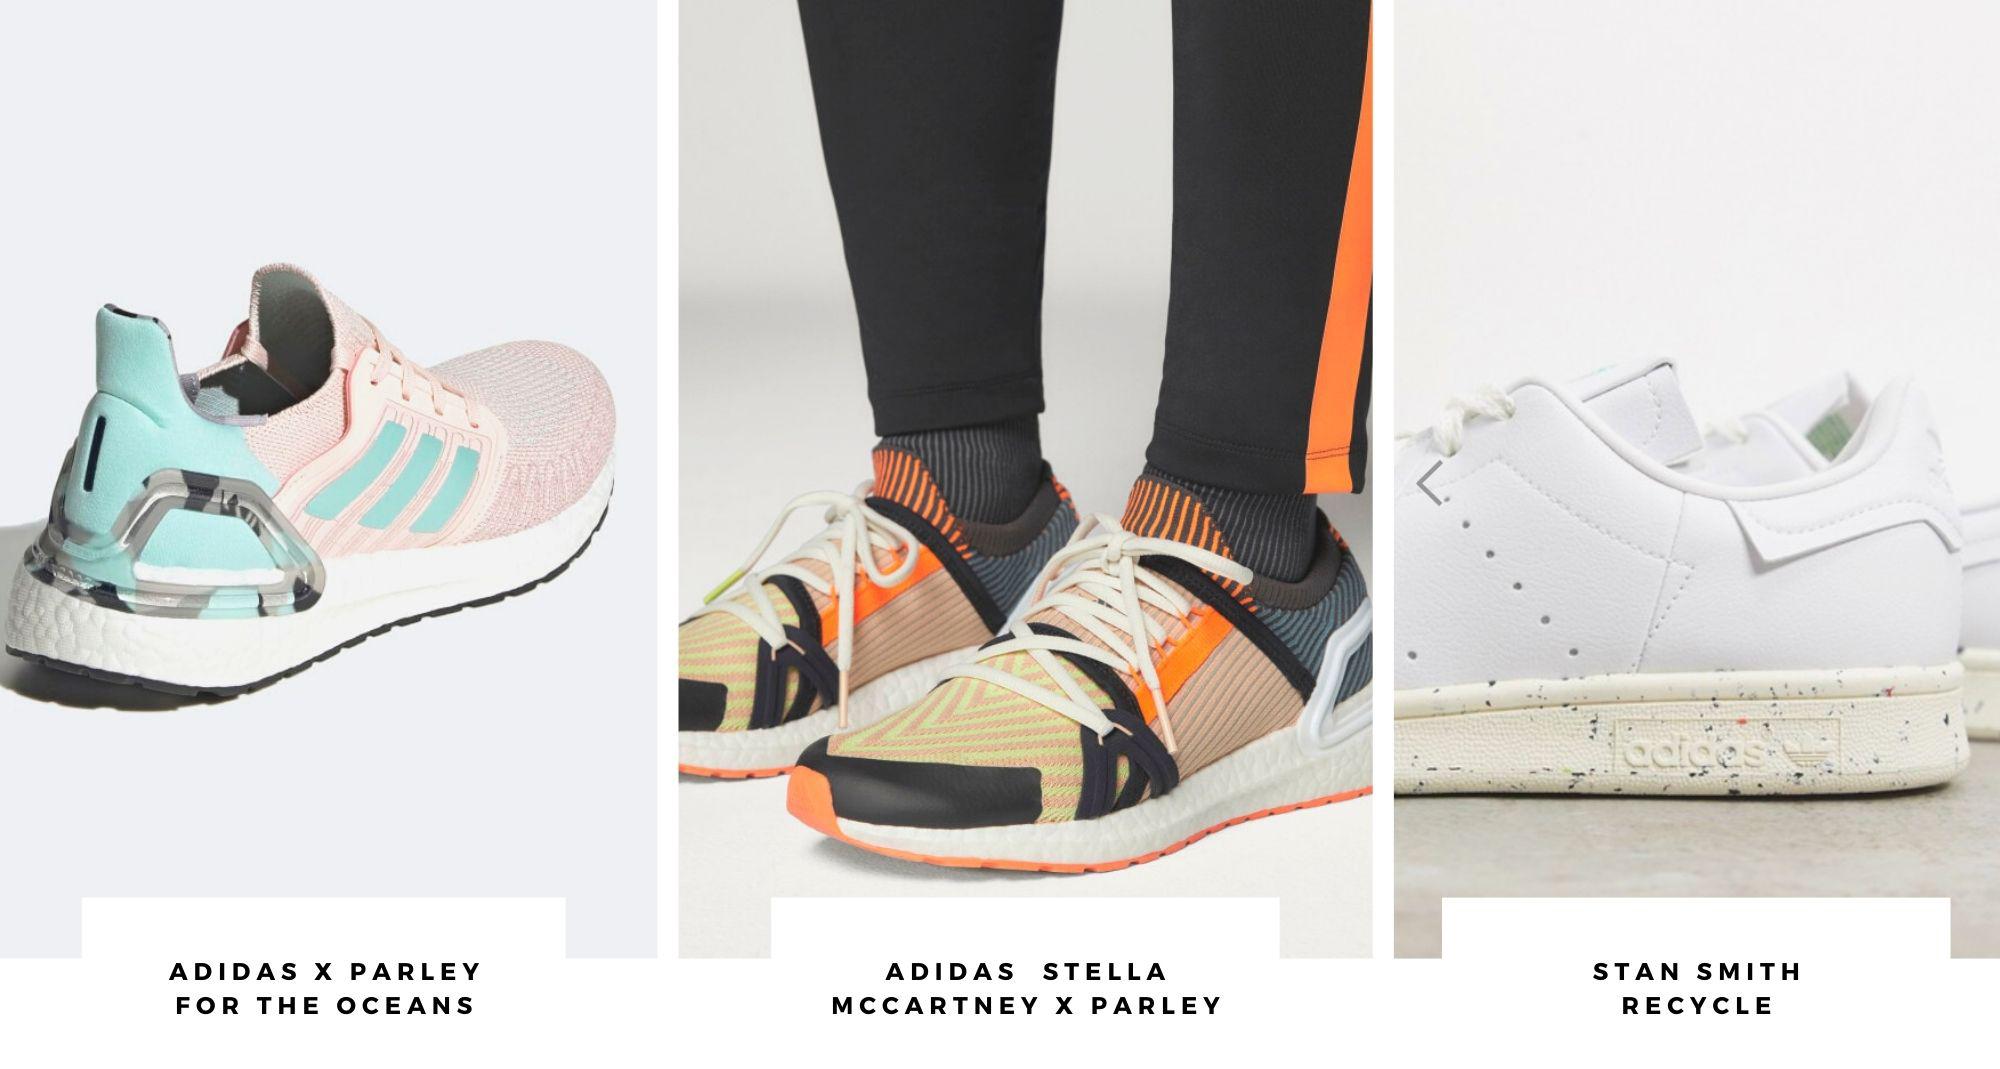 Scarpe sostenibili Adidas